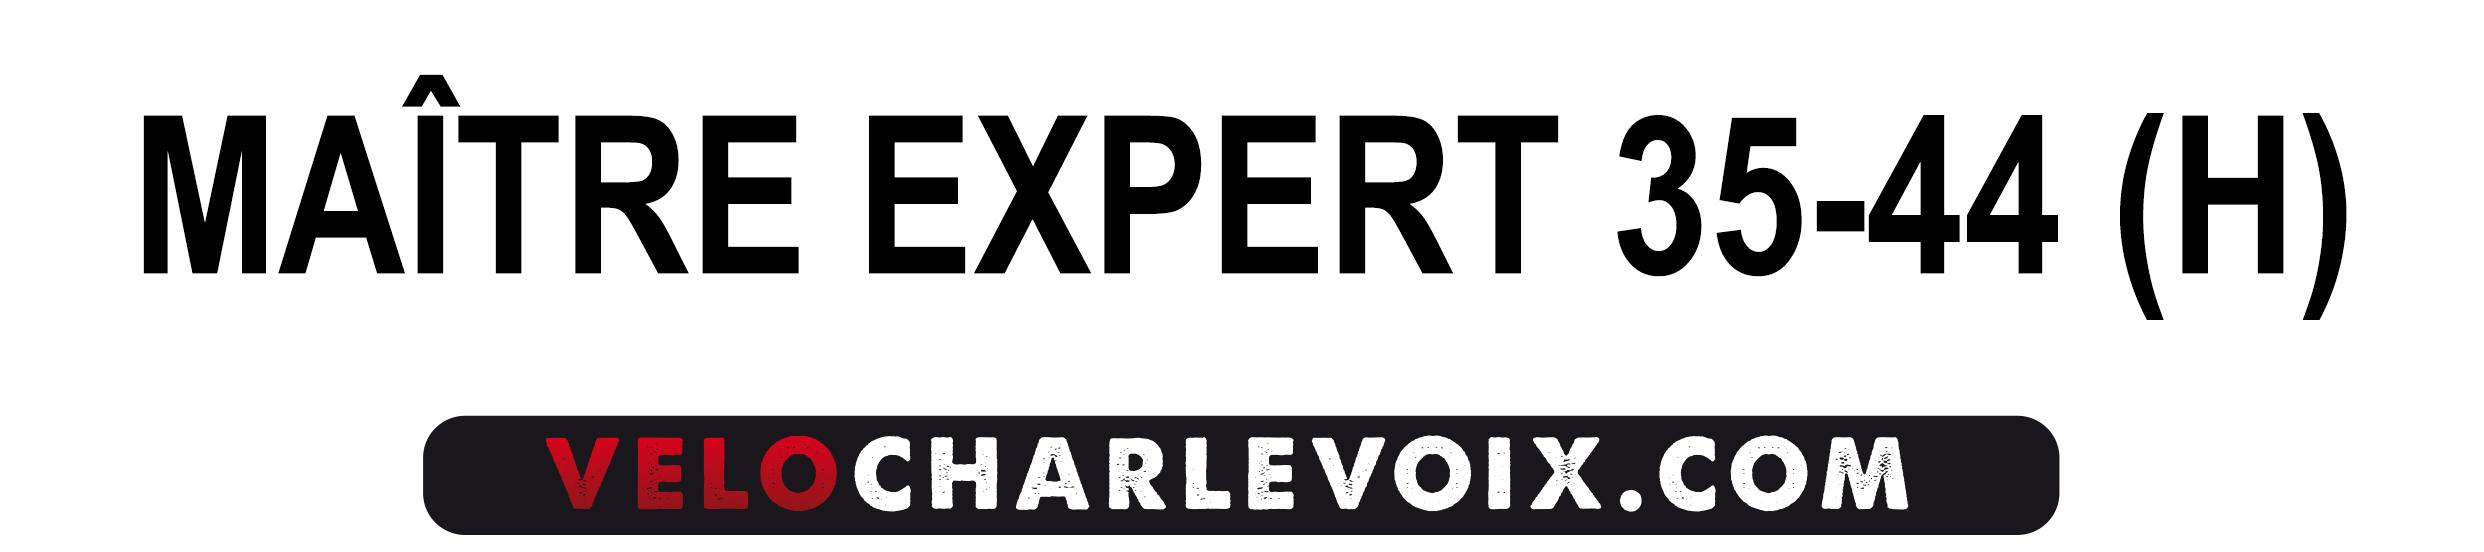 Categories Box Qc_Maitre expert 35-44 H